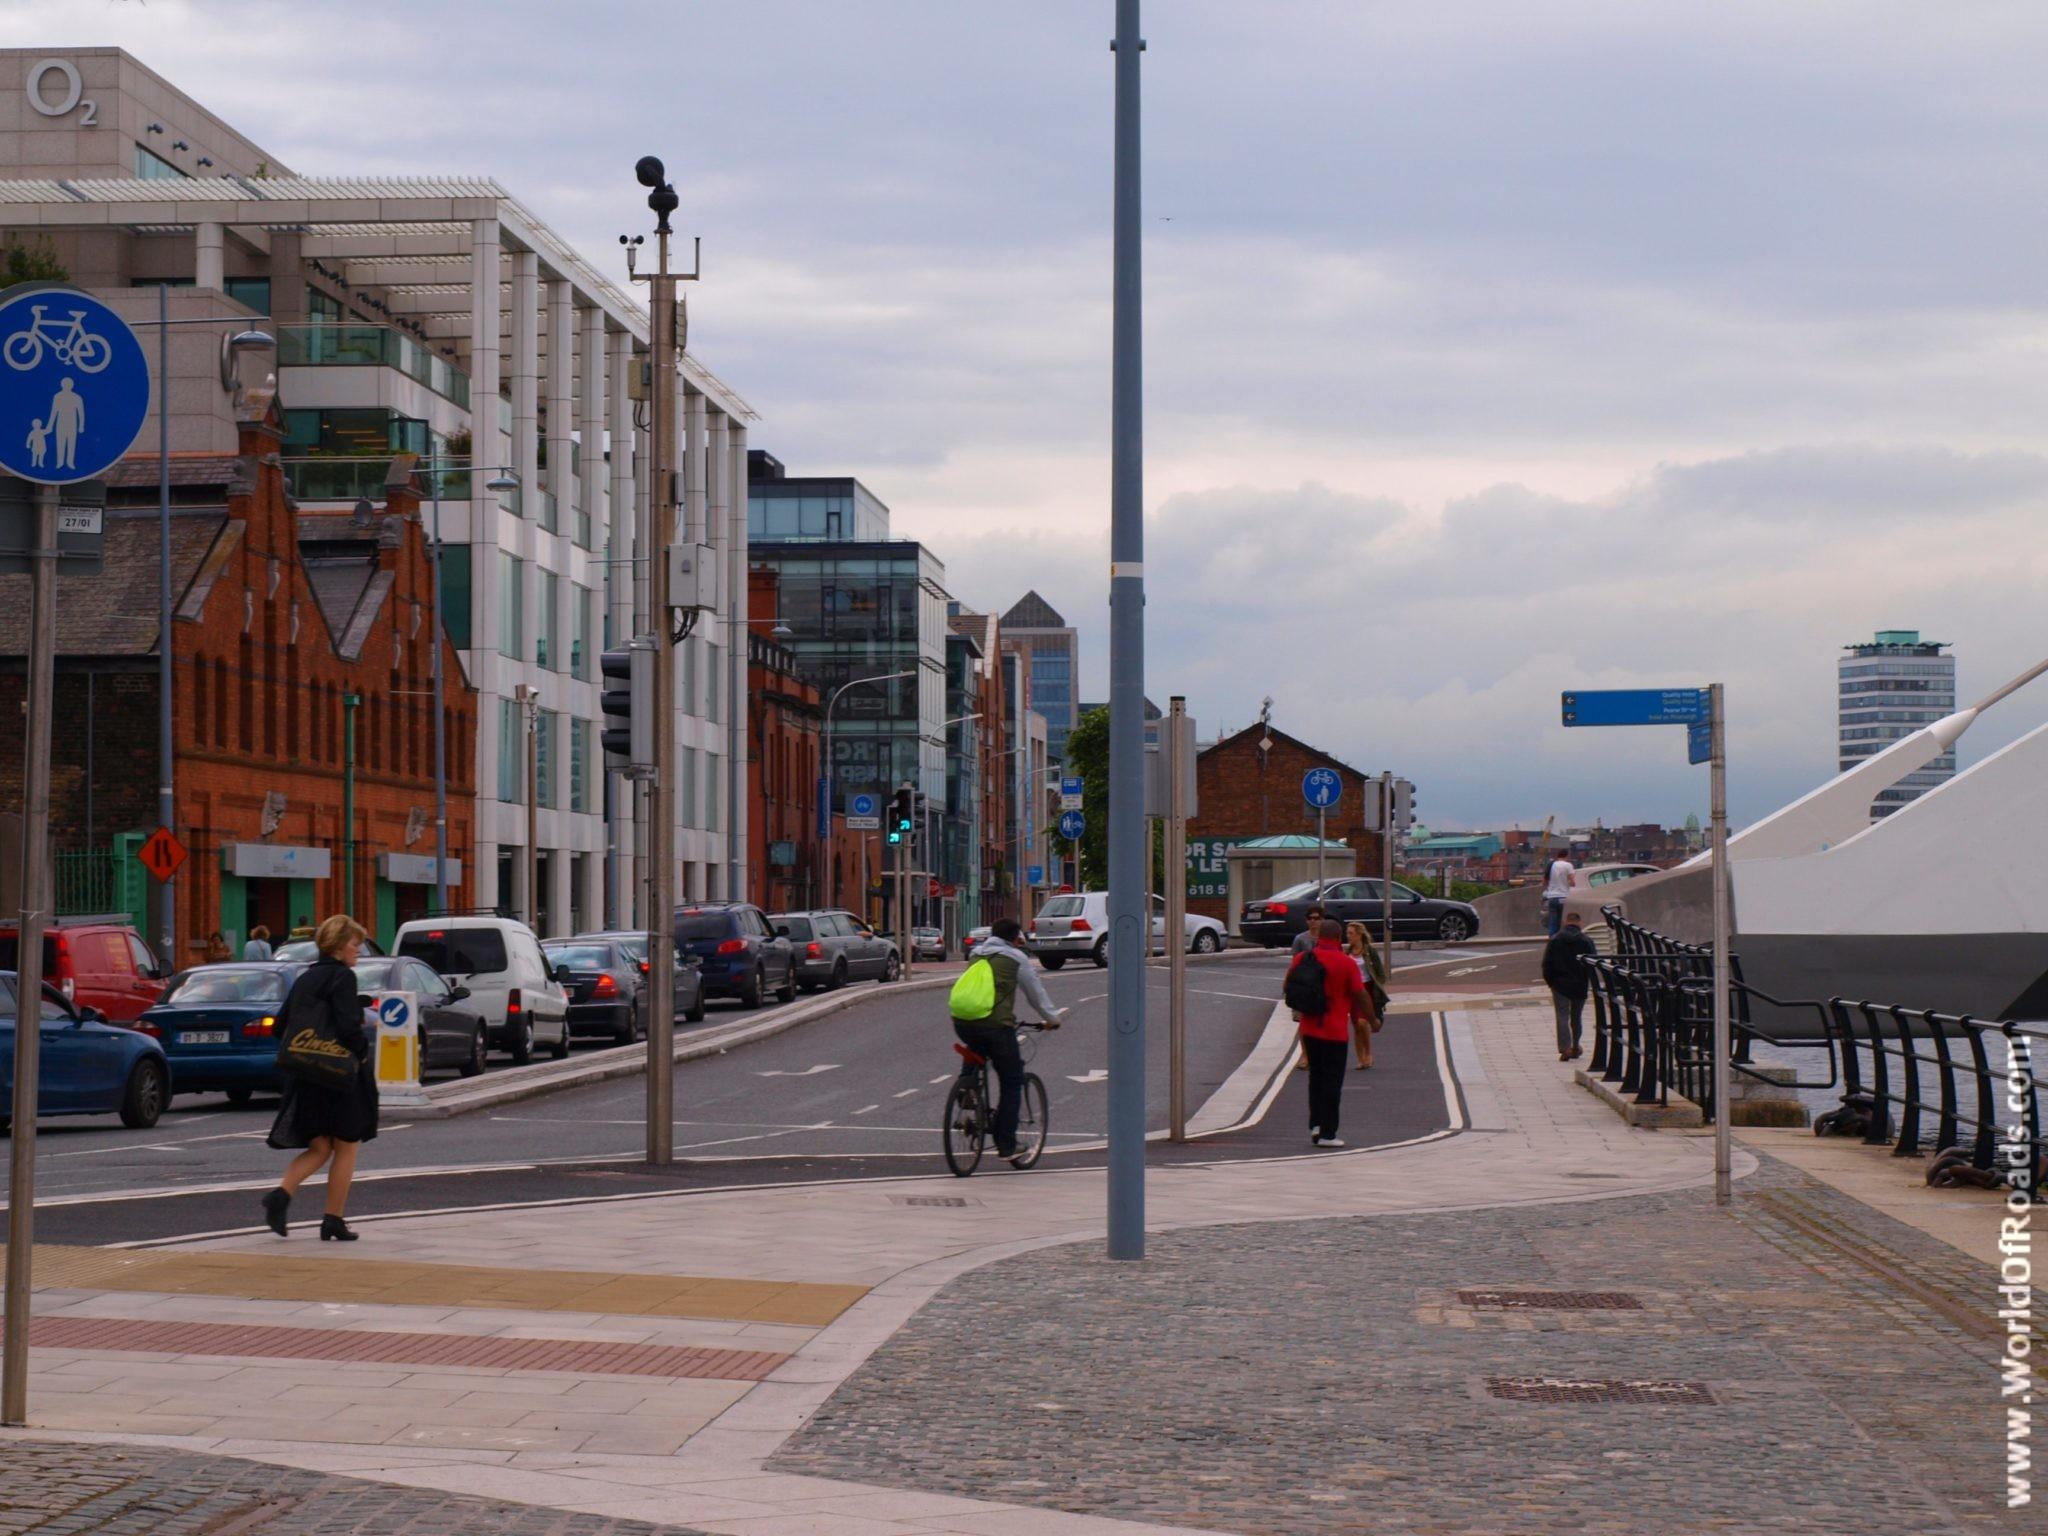 Велодорожки. Дублин. Ирландия.